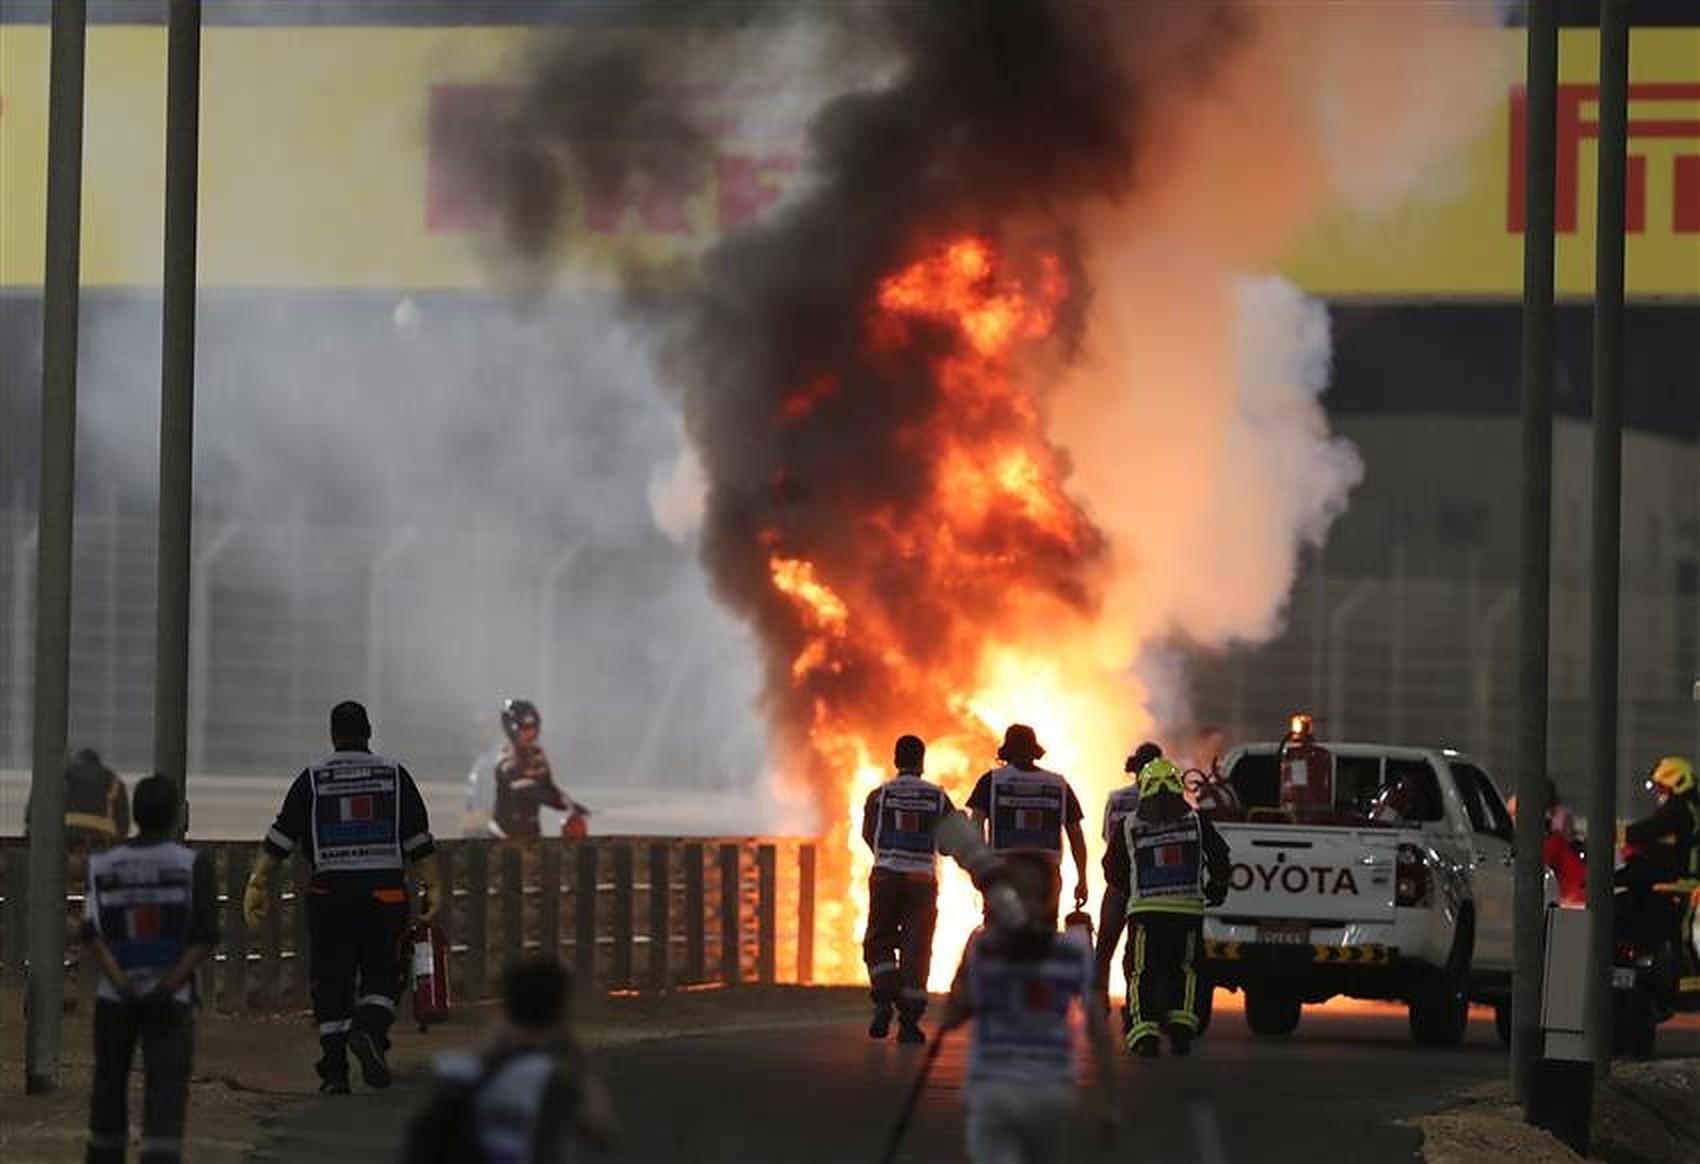 Sebastian Vettel speaks about Romain Grosjean's fiery crash at Bahrain GP - Formula1news.co.uk